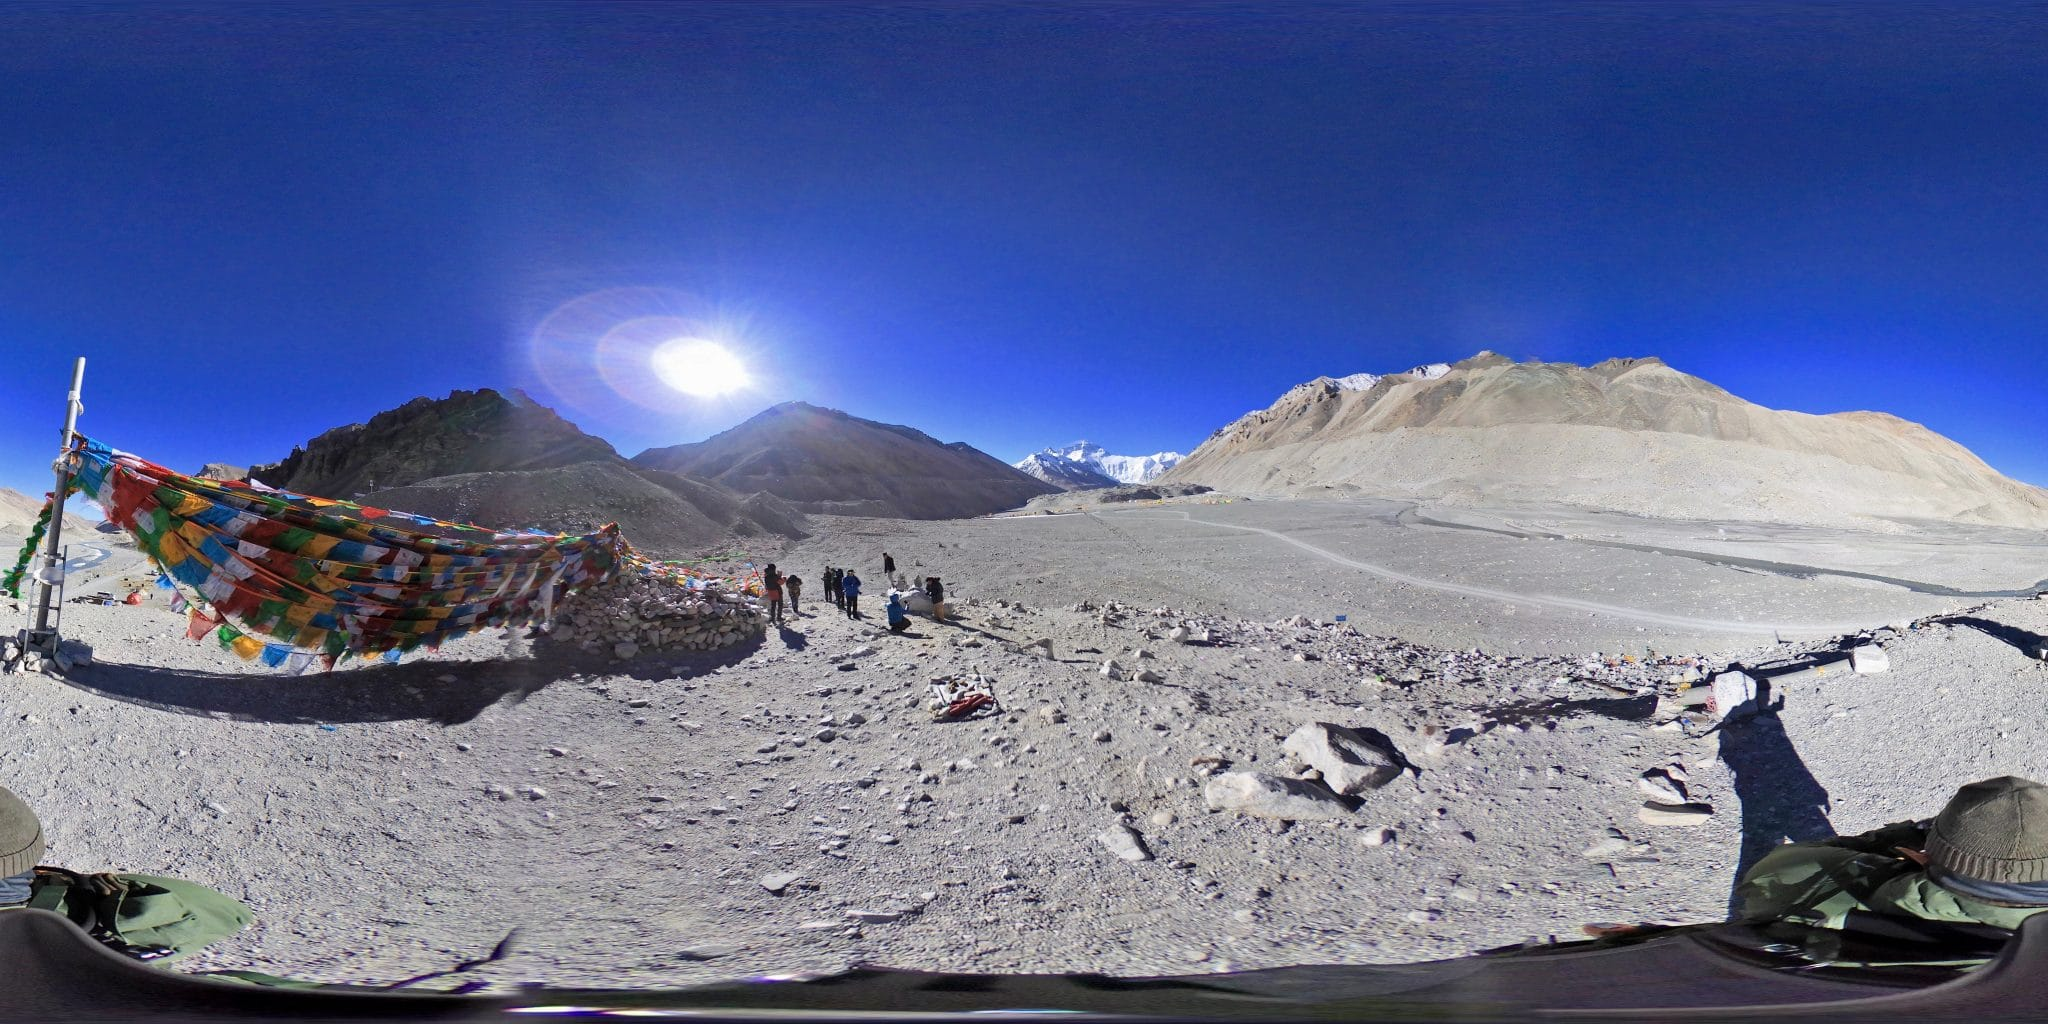 Imagen cercana al campo base del Everest